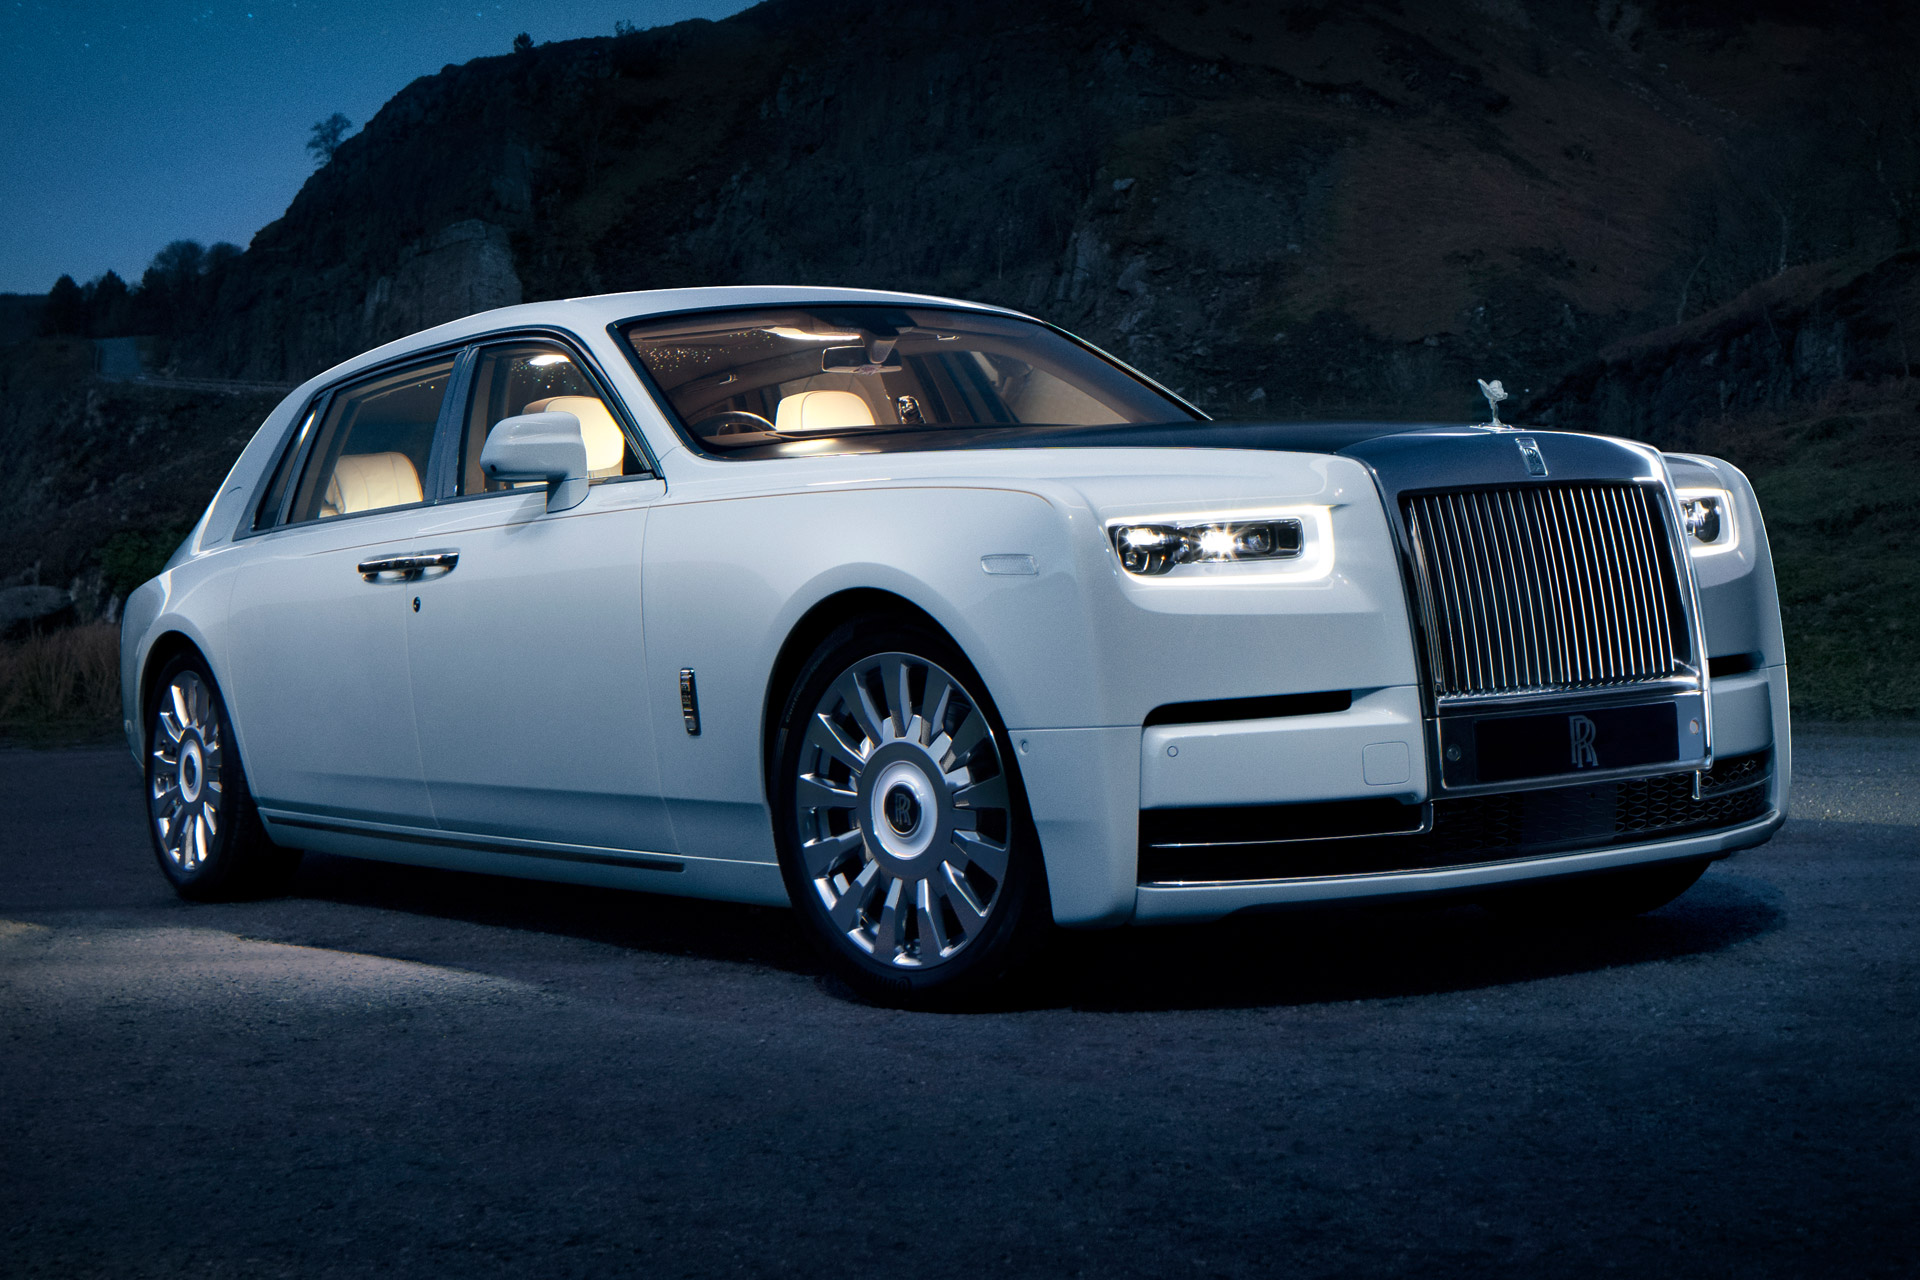 2019 Rolls-Royce Phantom Tranquillity Sedan | Uncrate